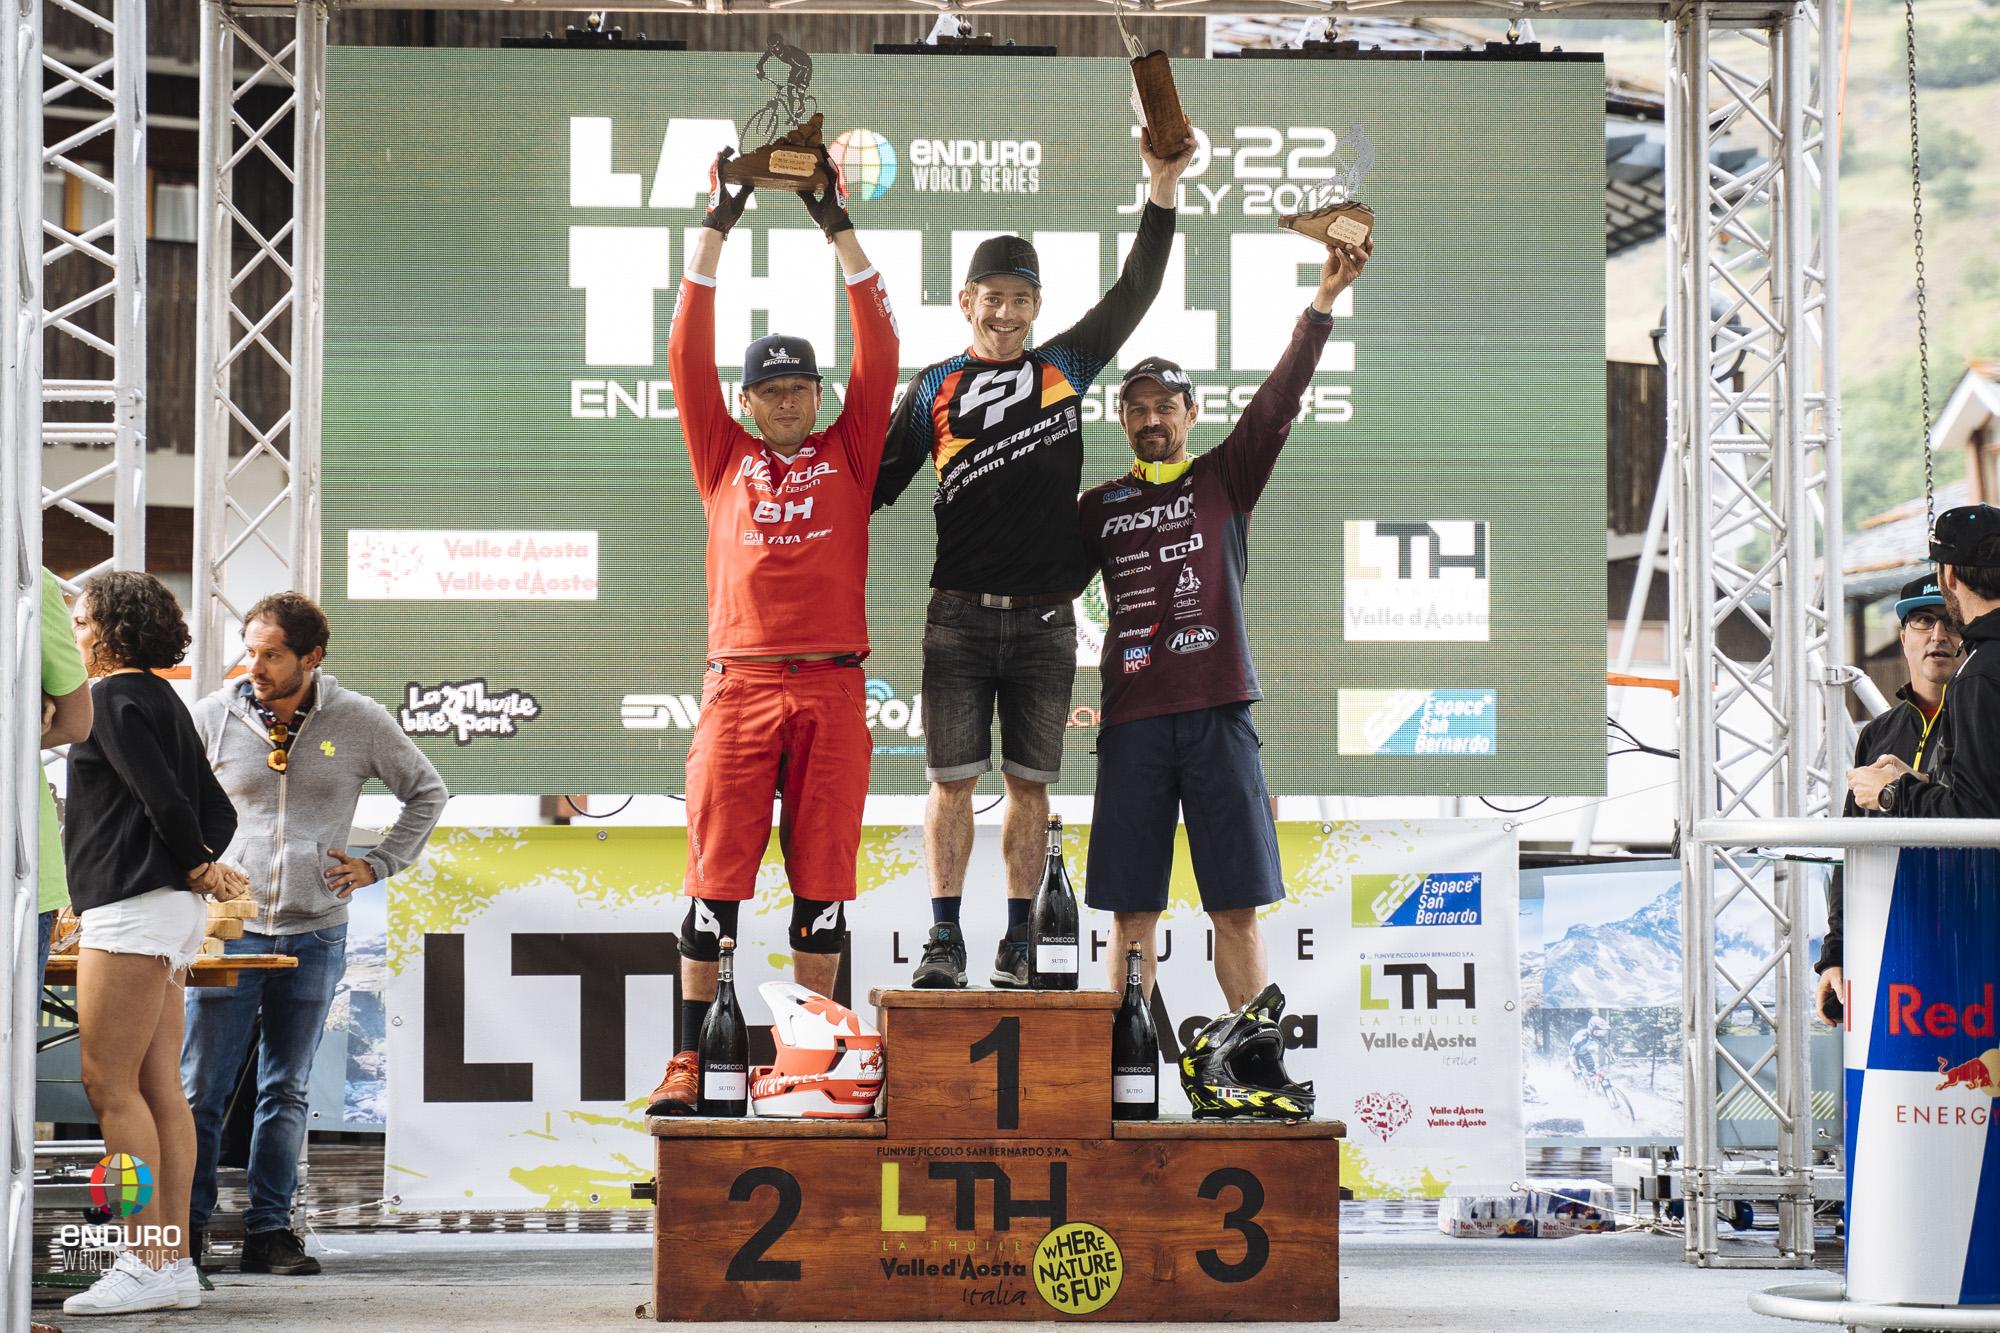 Master Men podium, 1st Florian Golay, 2nd Karim Amour, 3rd Bruno Zanchi